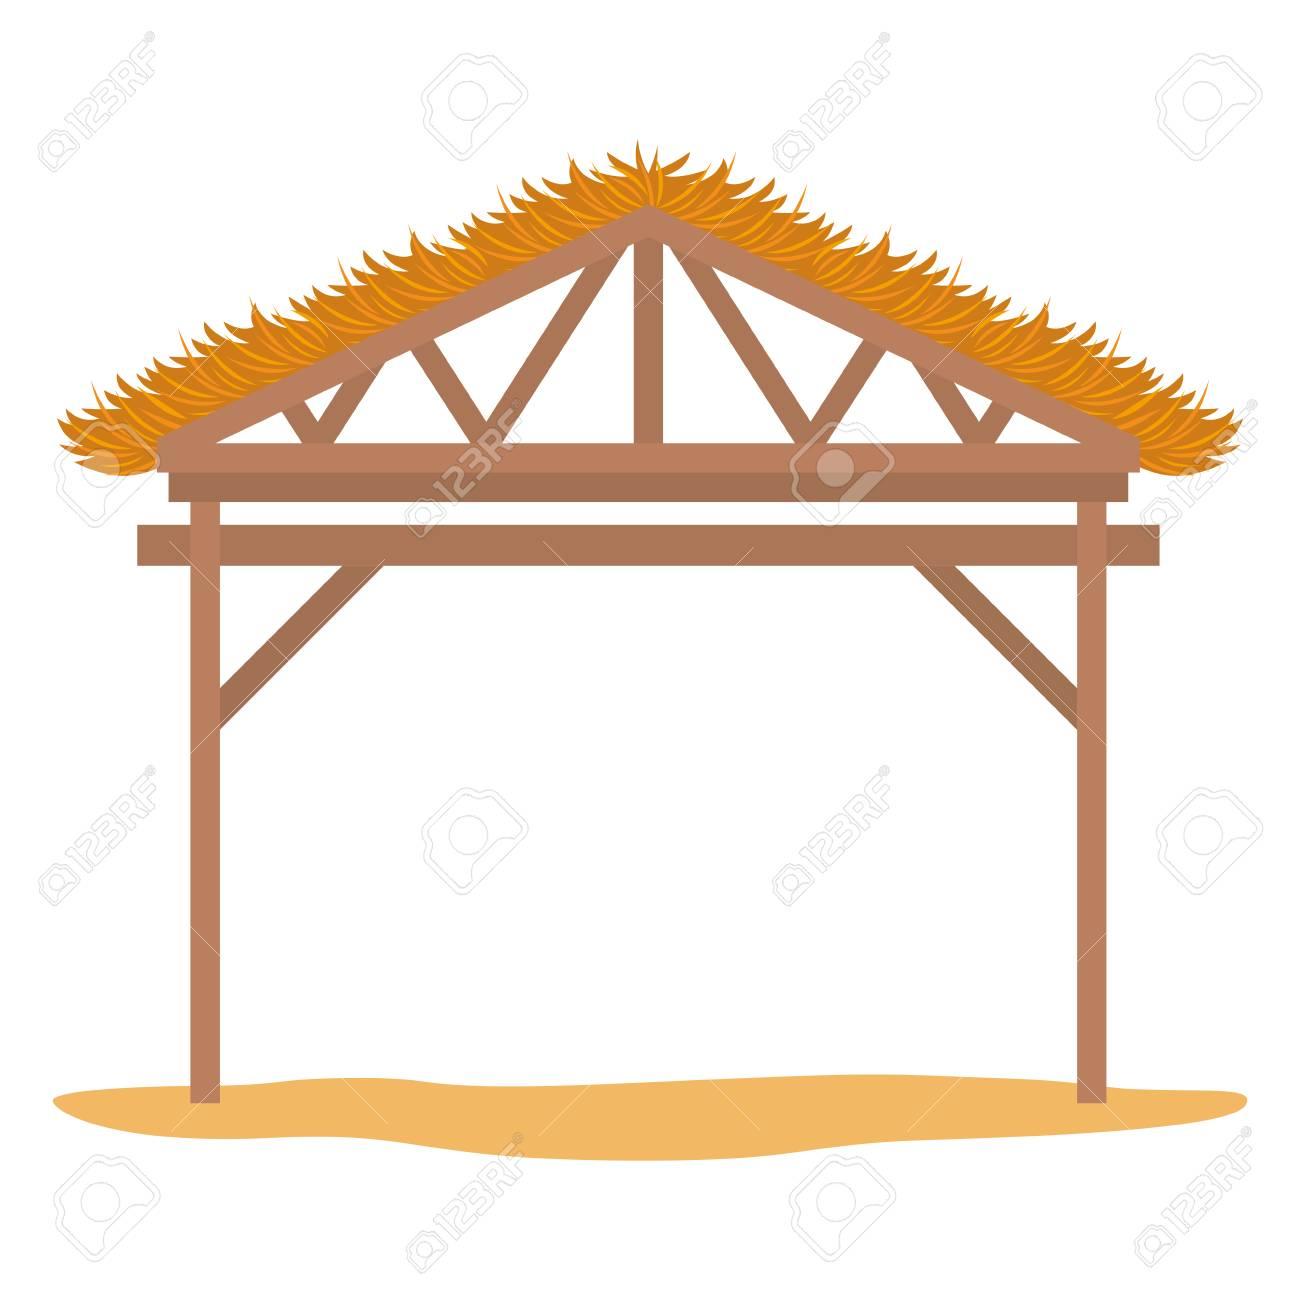 wooden stable manger icon vector illustration design - 110139804